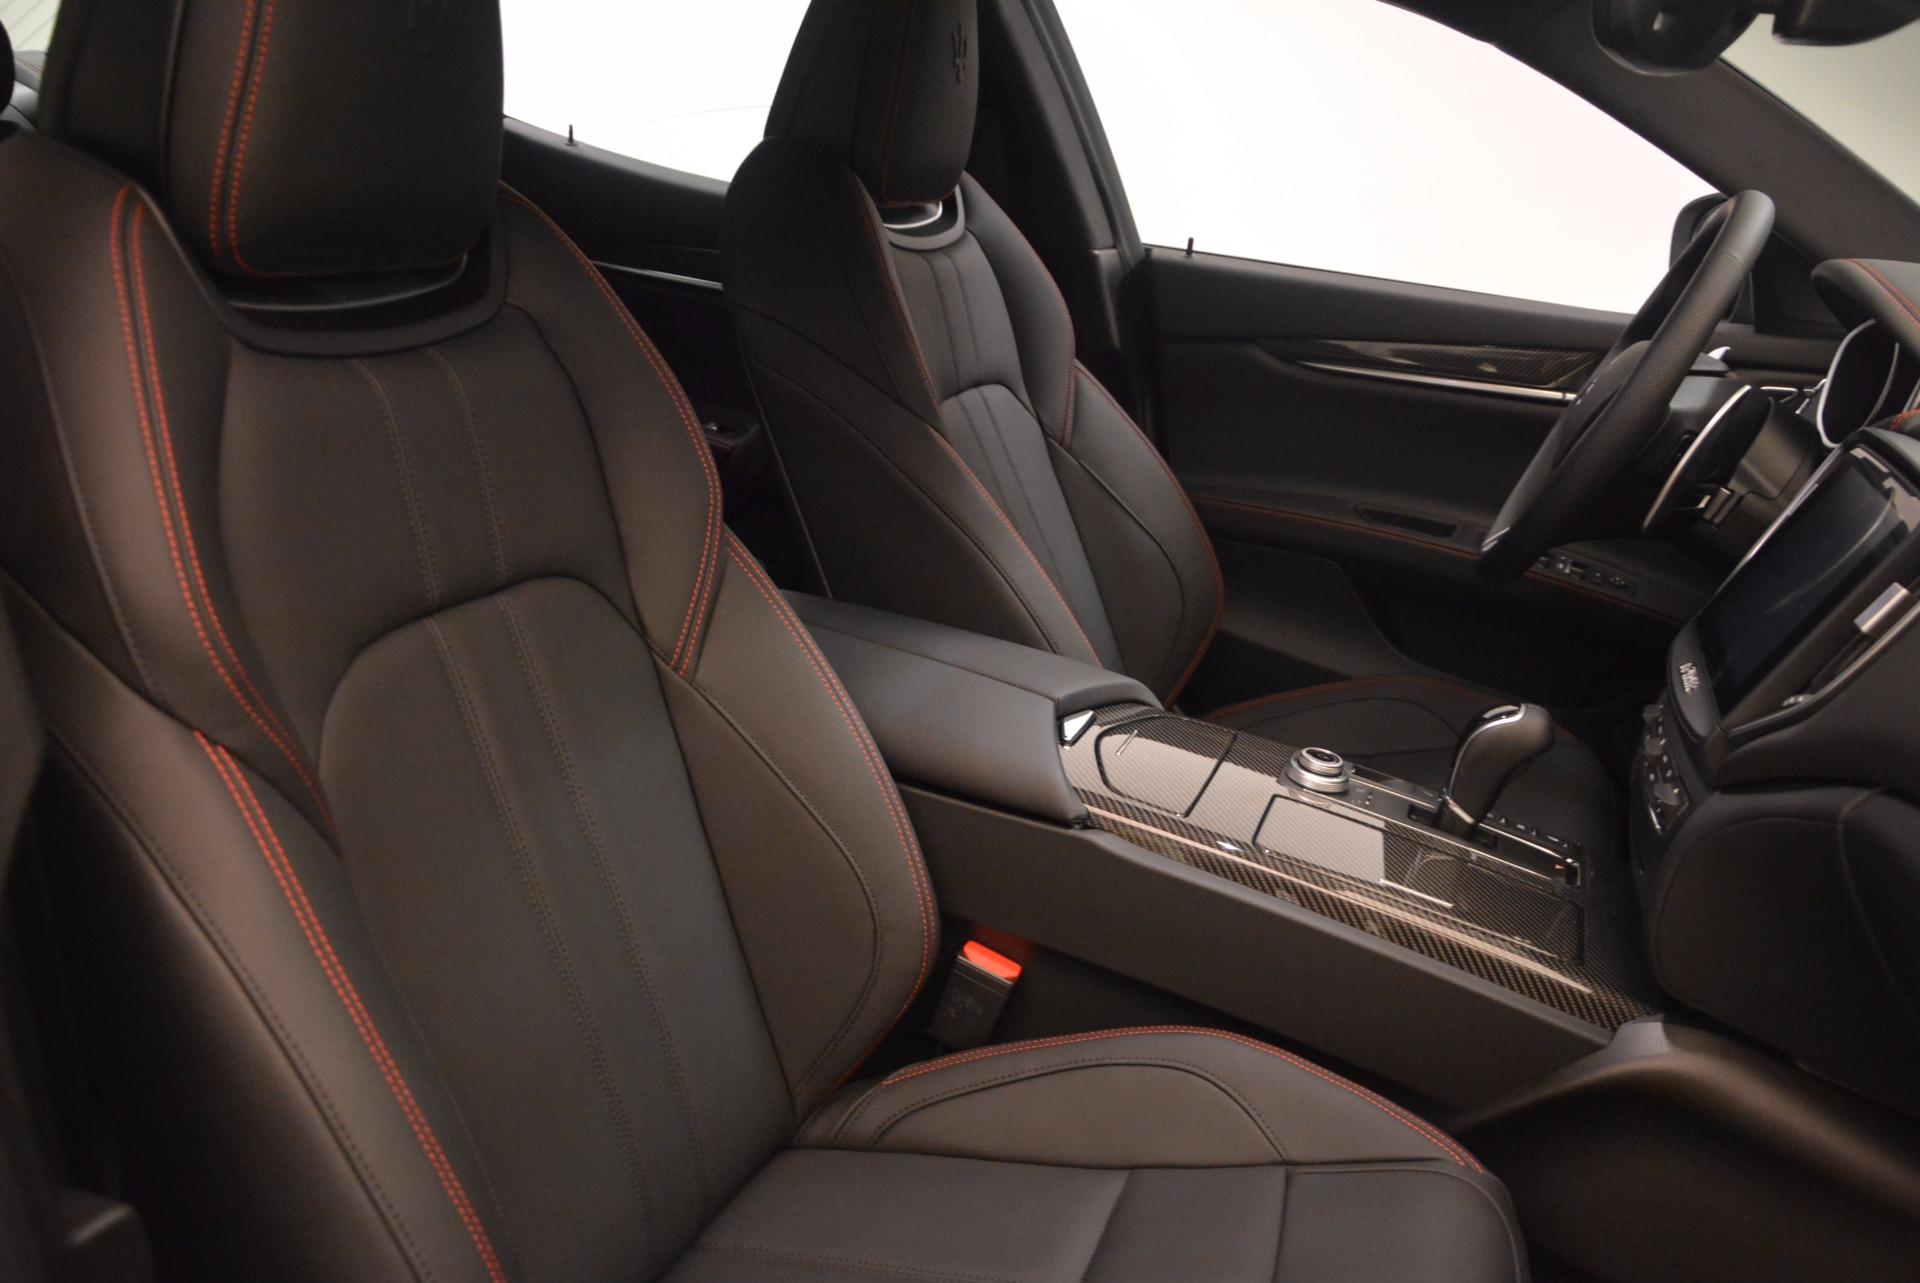 New 2018 Maserati Ghibli S Q4 GranSport For Sale In Greenwich, CT 1569_p21